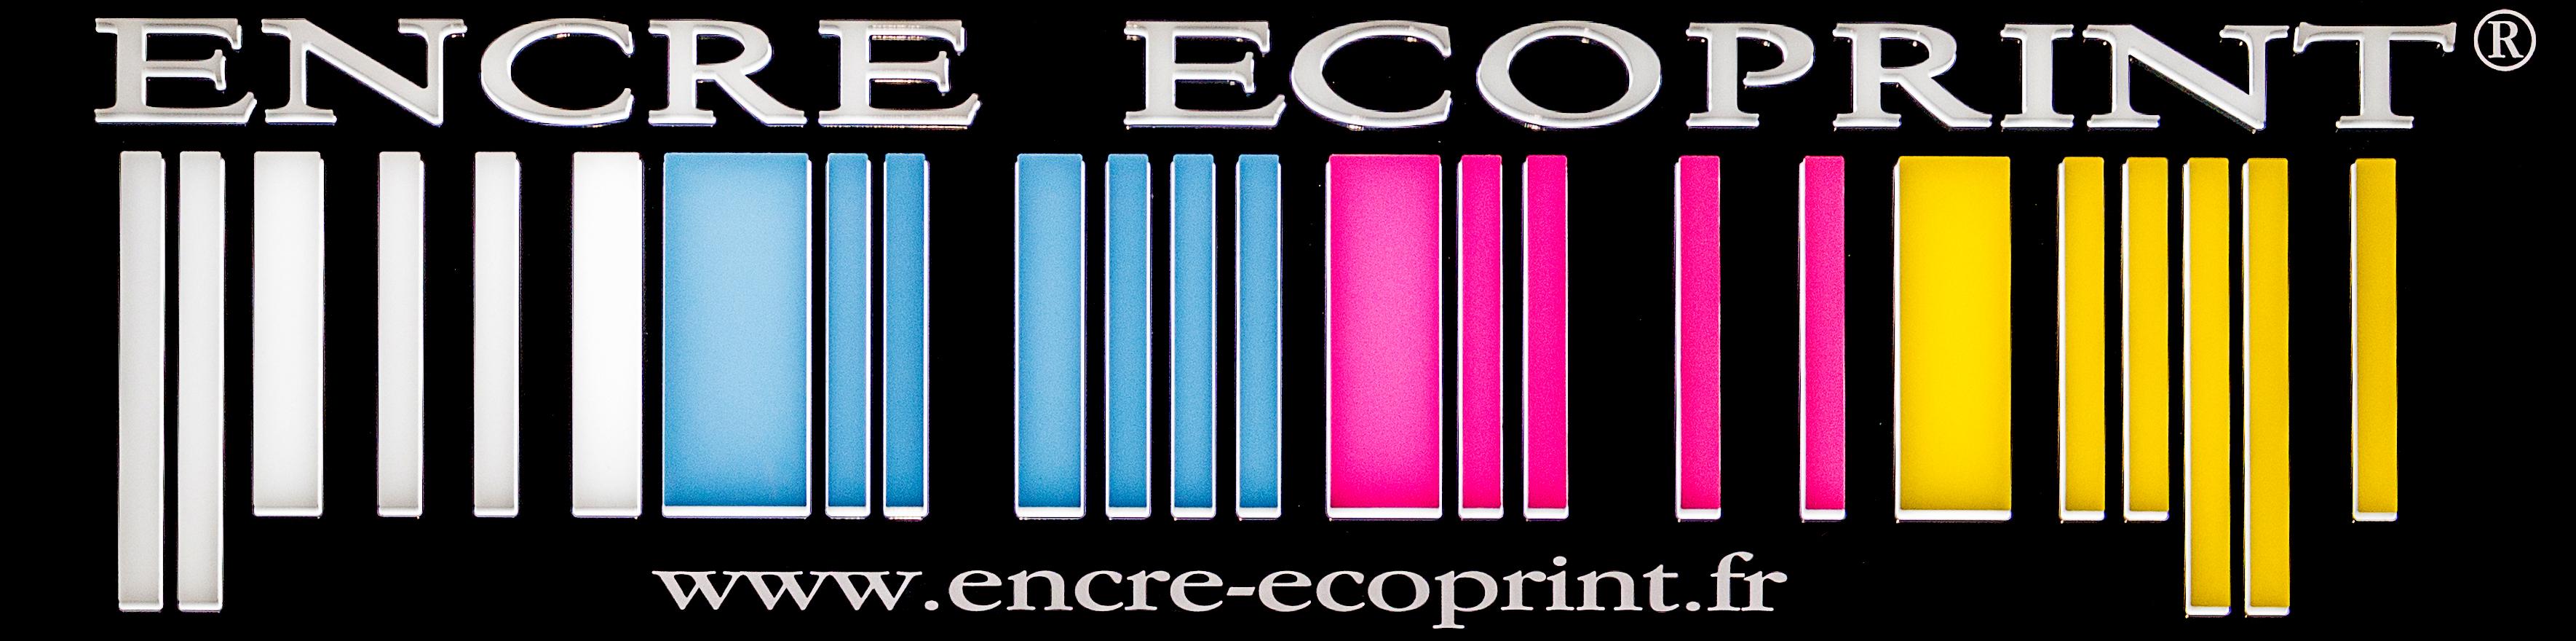 ENCRE ECOPRINT